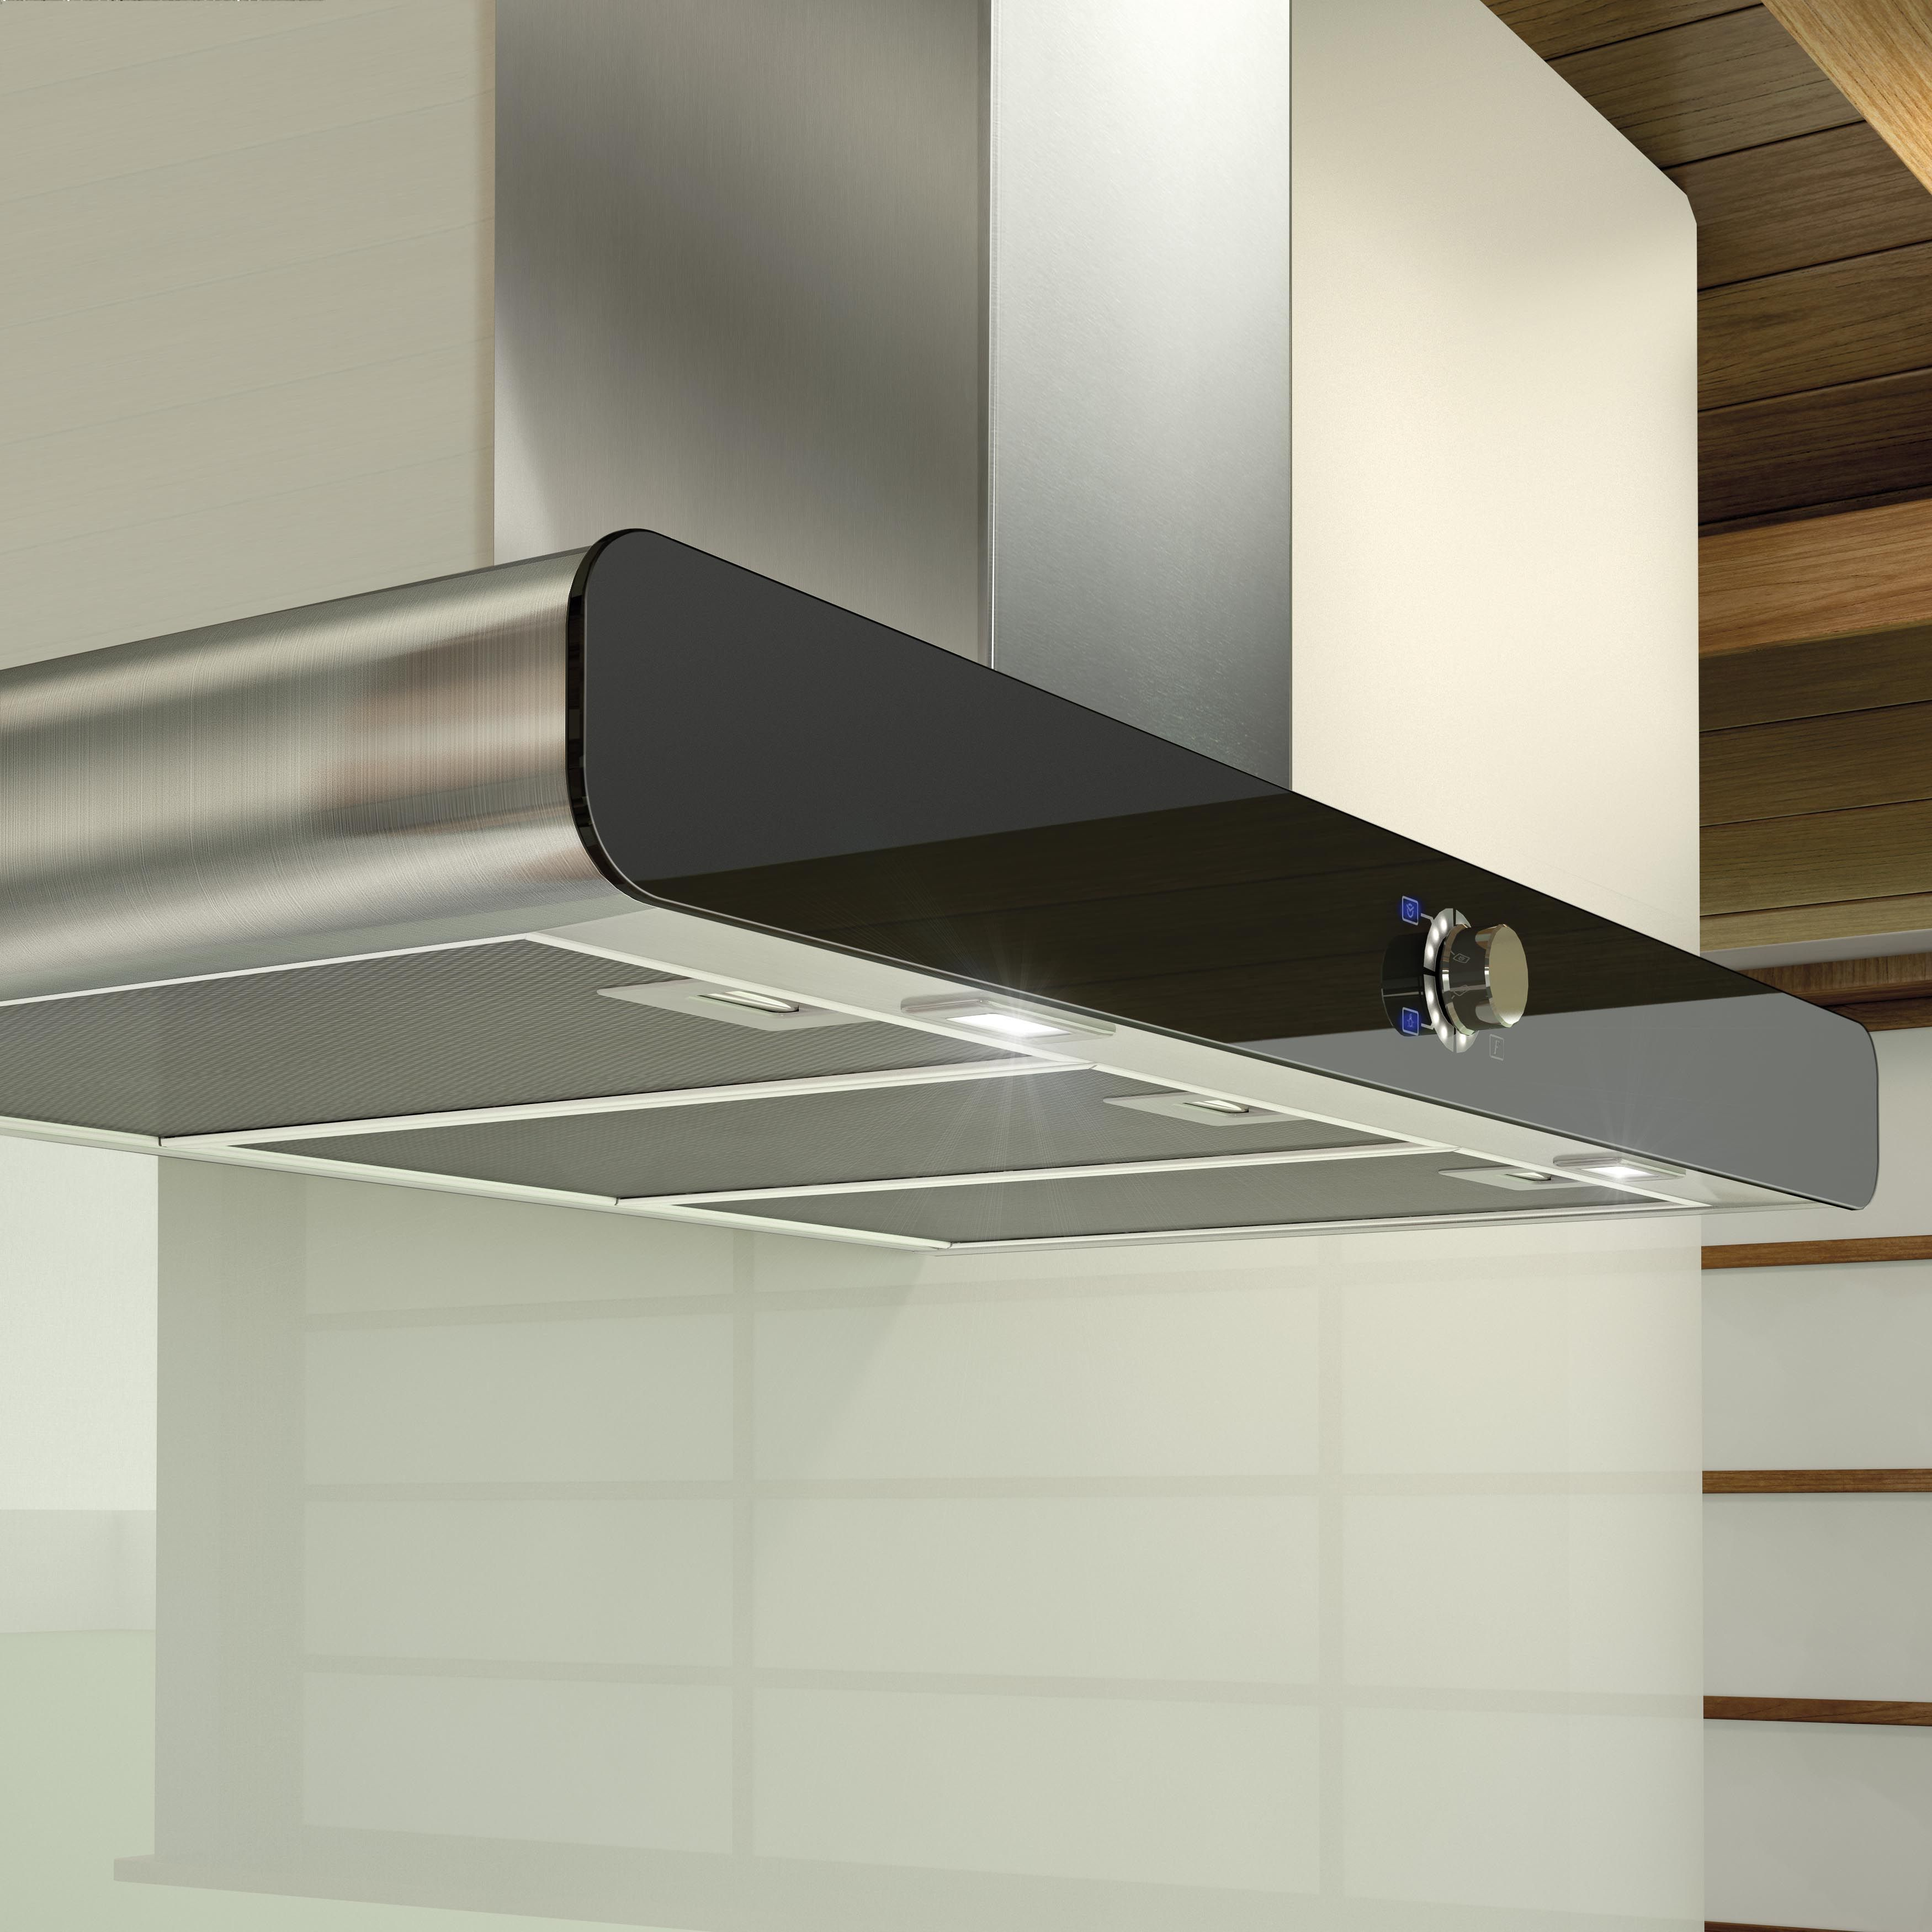 f122 slim particolare house airforce cooker hoods. Black Bedroom Furniture Sets. Home Design Ideas